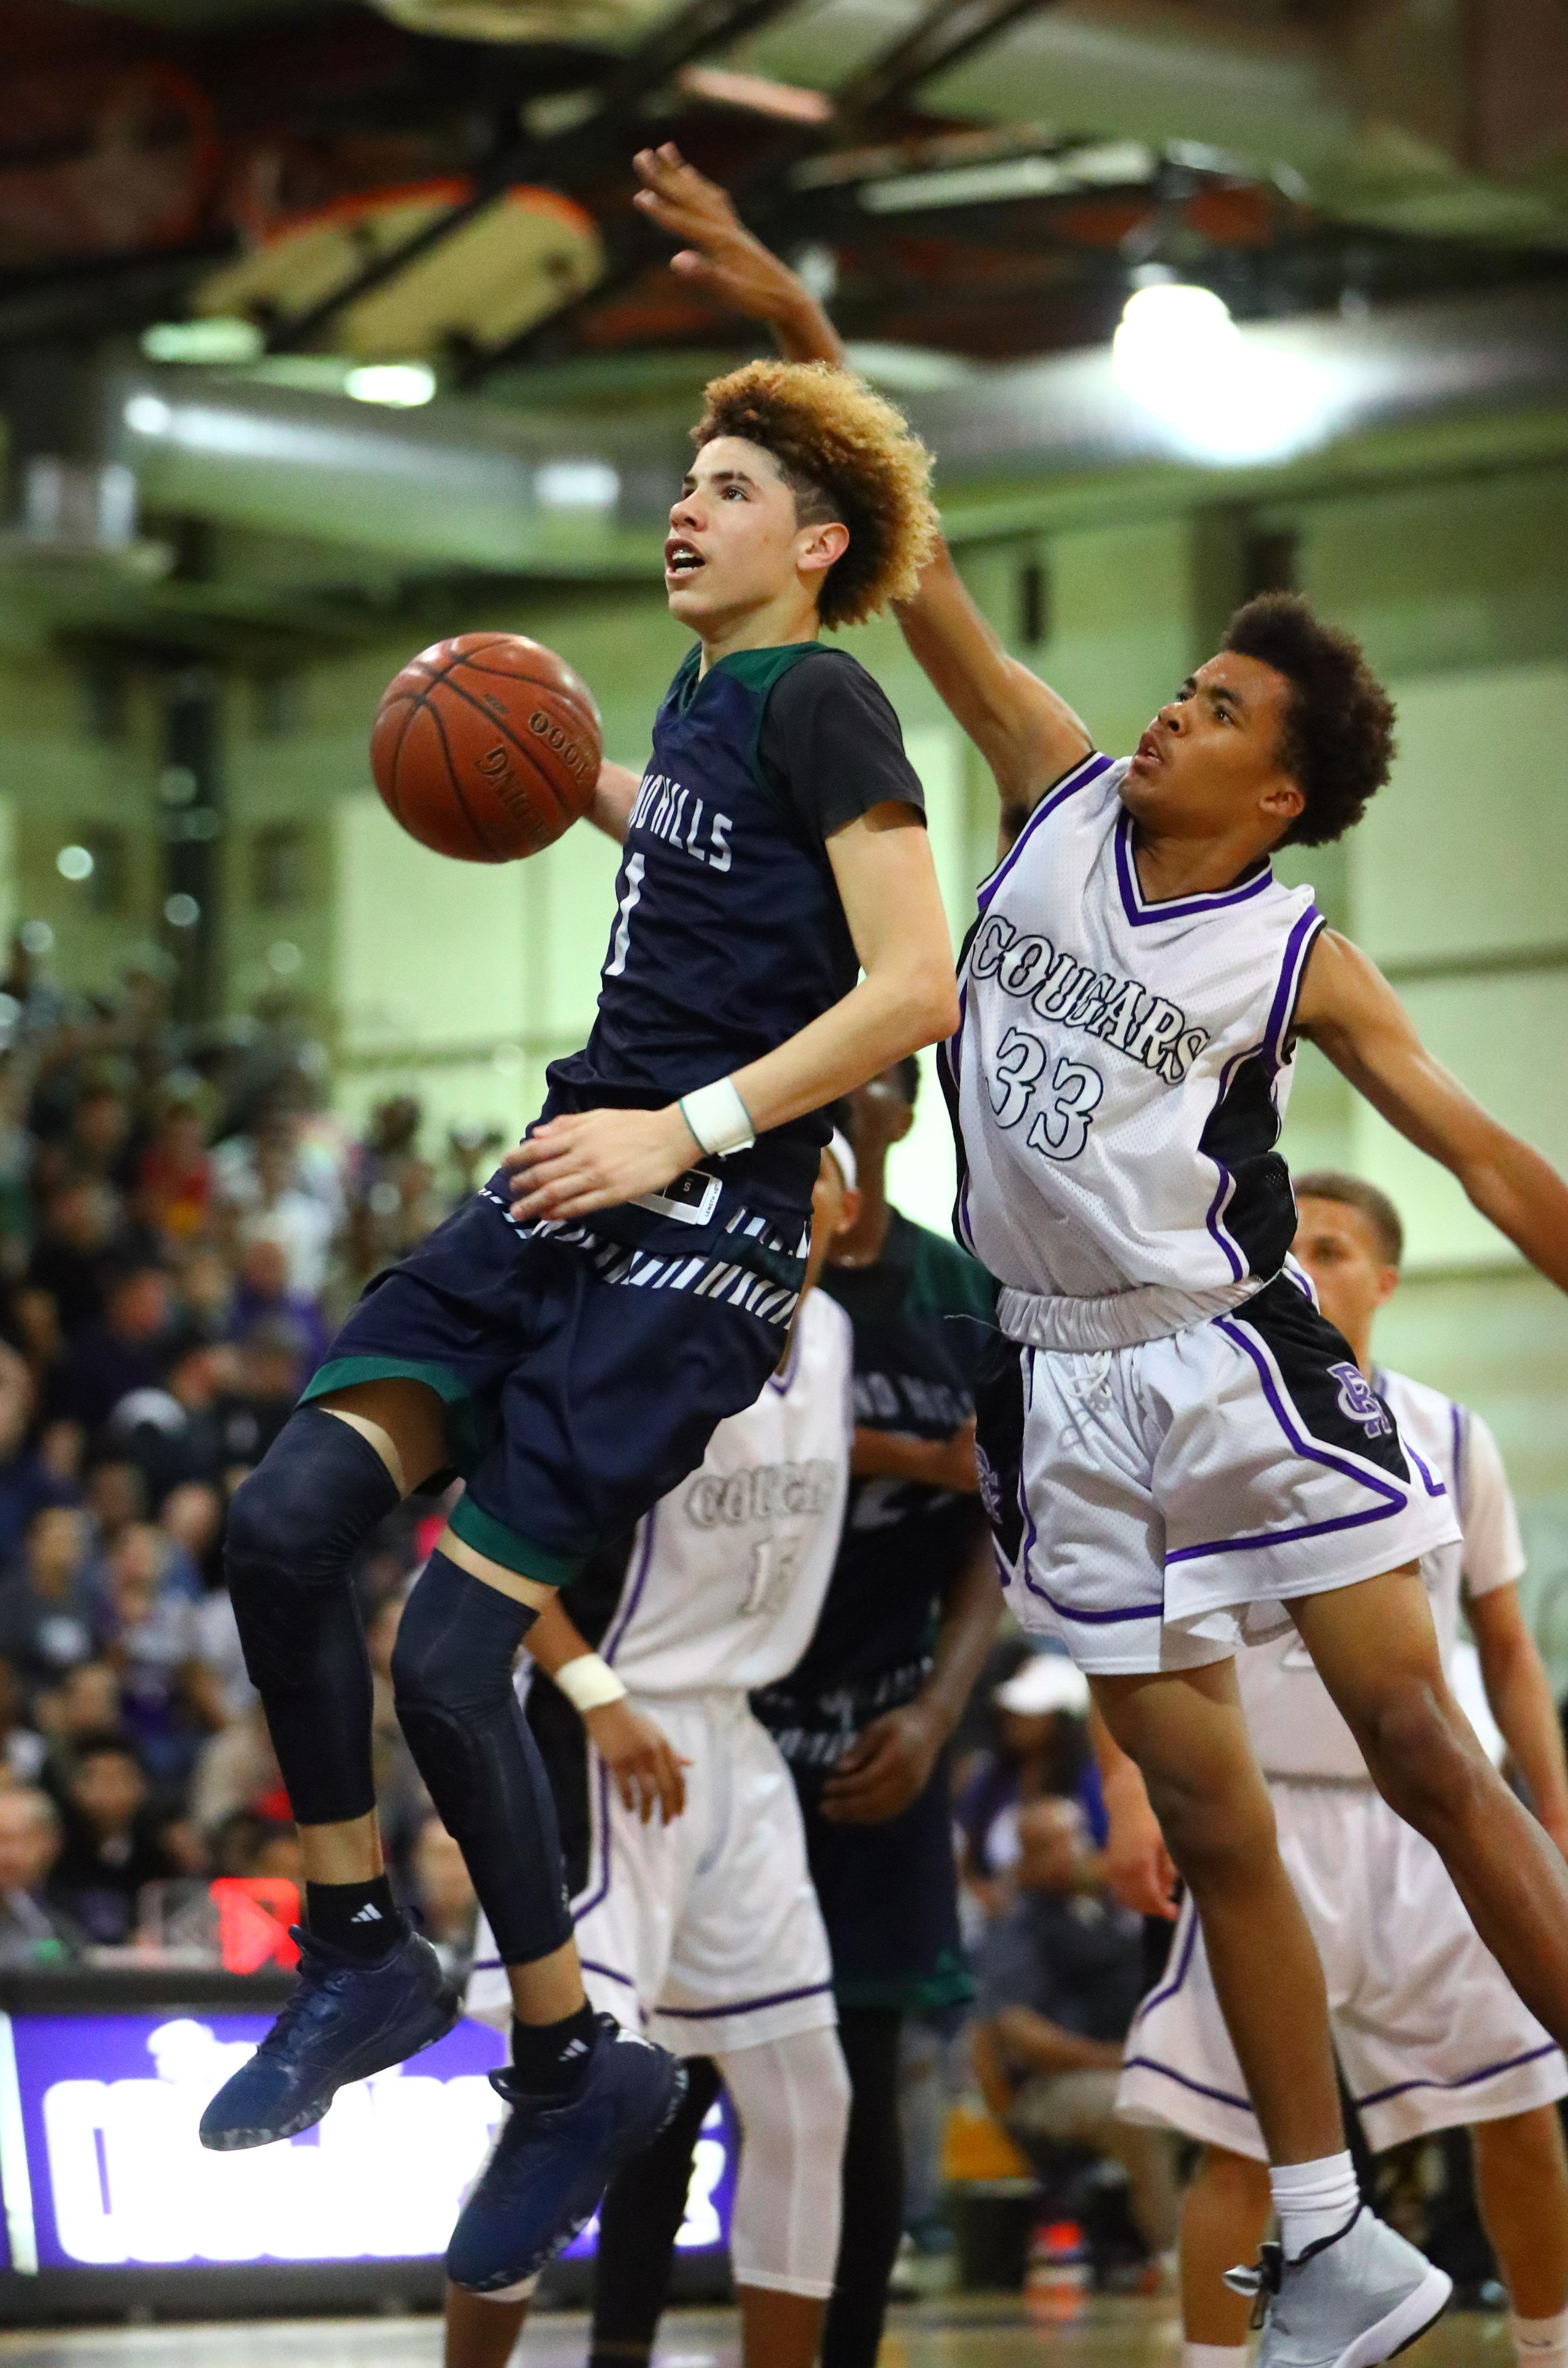 High School Basketball: Chino Hills at Rancho Cucamonga